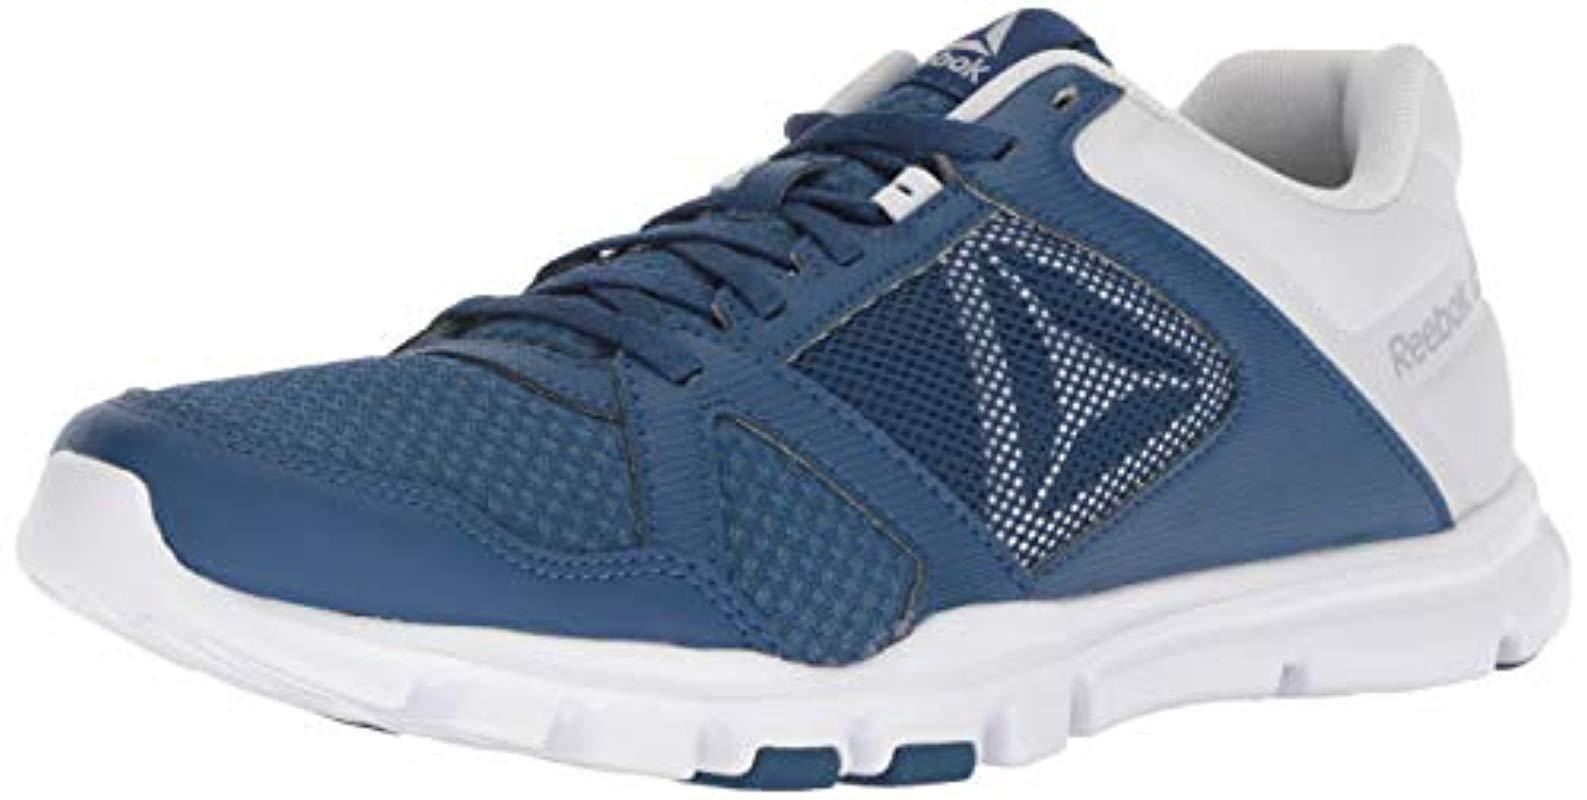 024b702e5bec47 Reebok. Men s Blue Yourflex Train 10 Cross Trainer.  36 From Amazon Prime